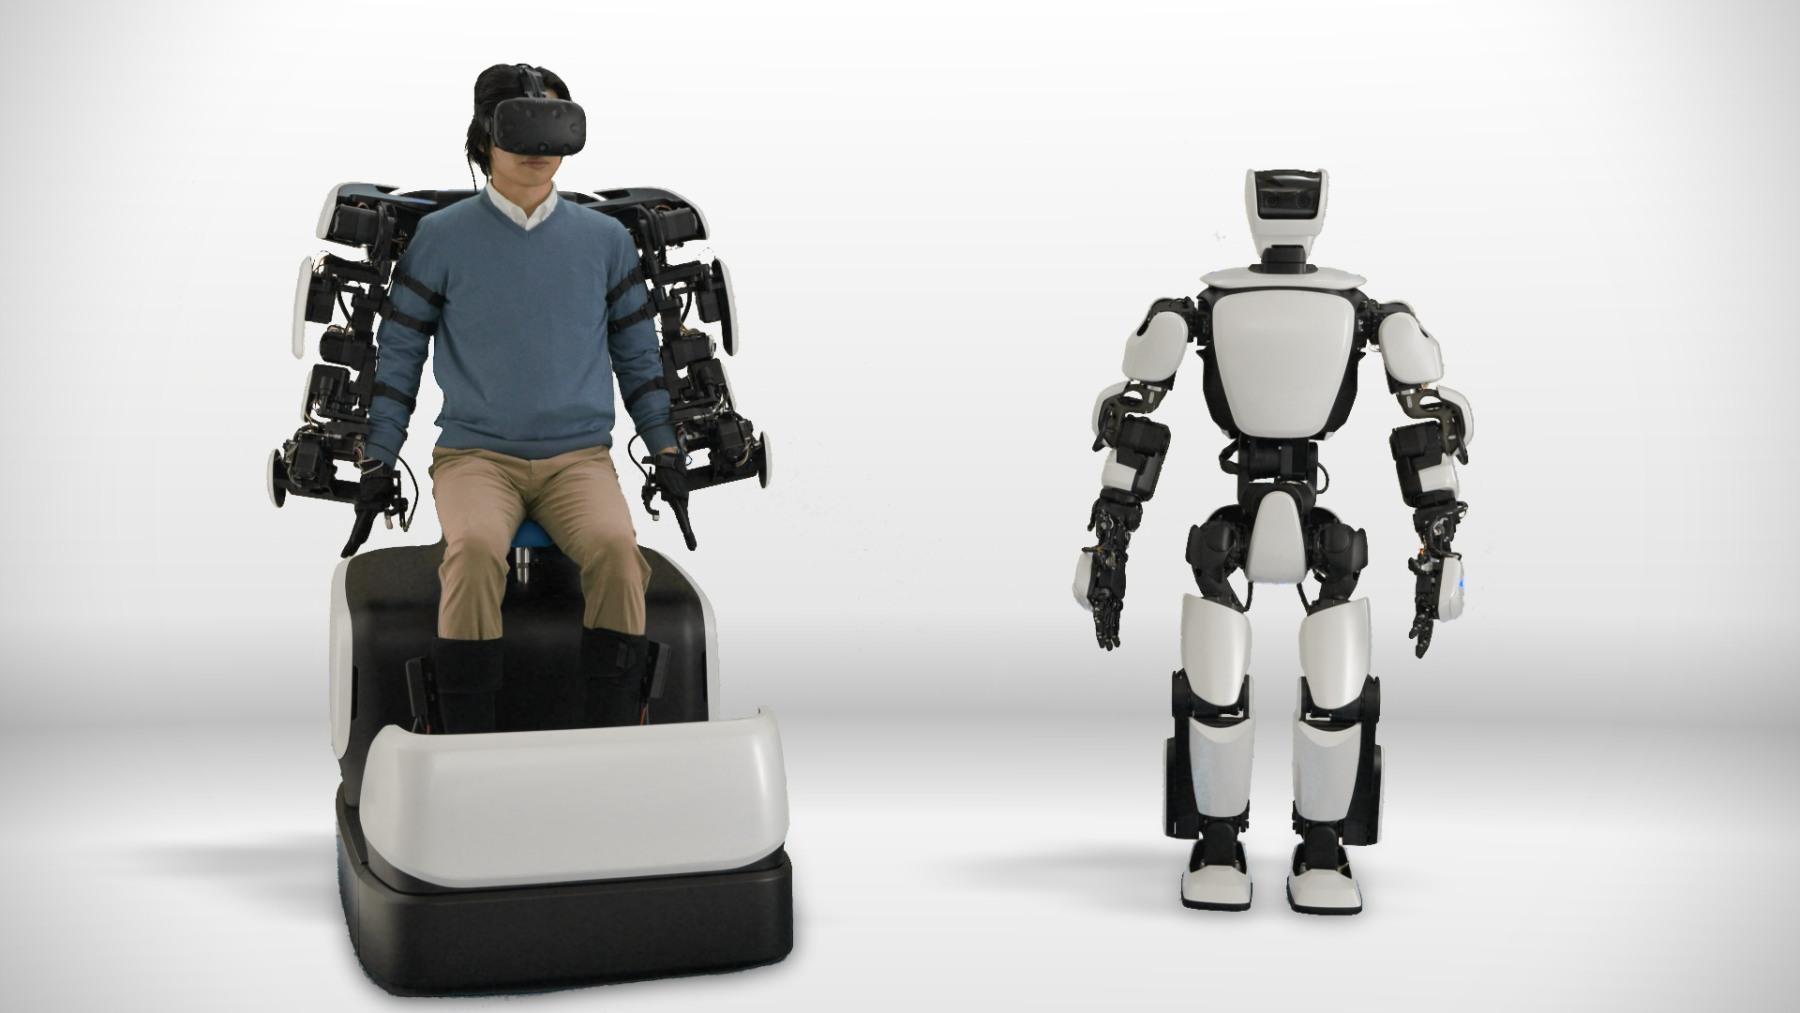 Xprize für telepräsenten Avatar-Roboter ausgelobt